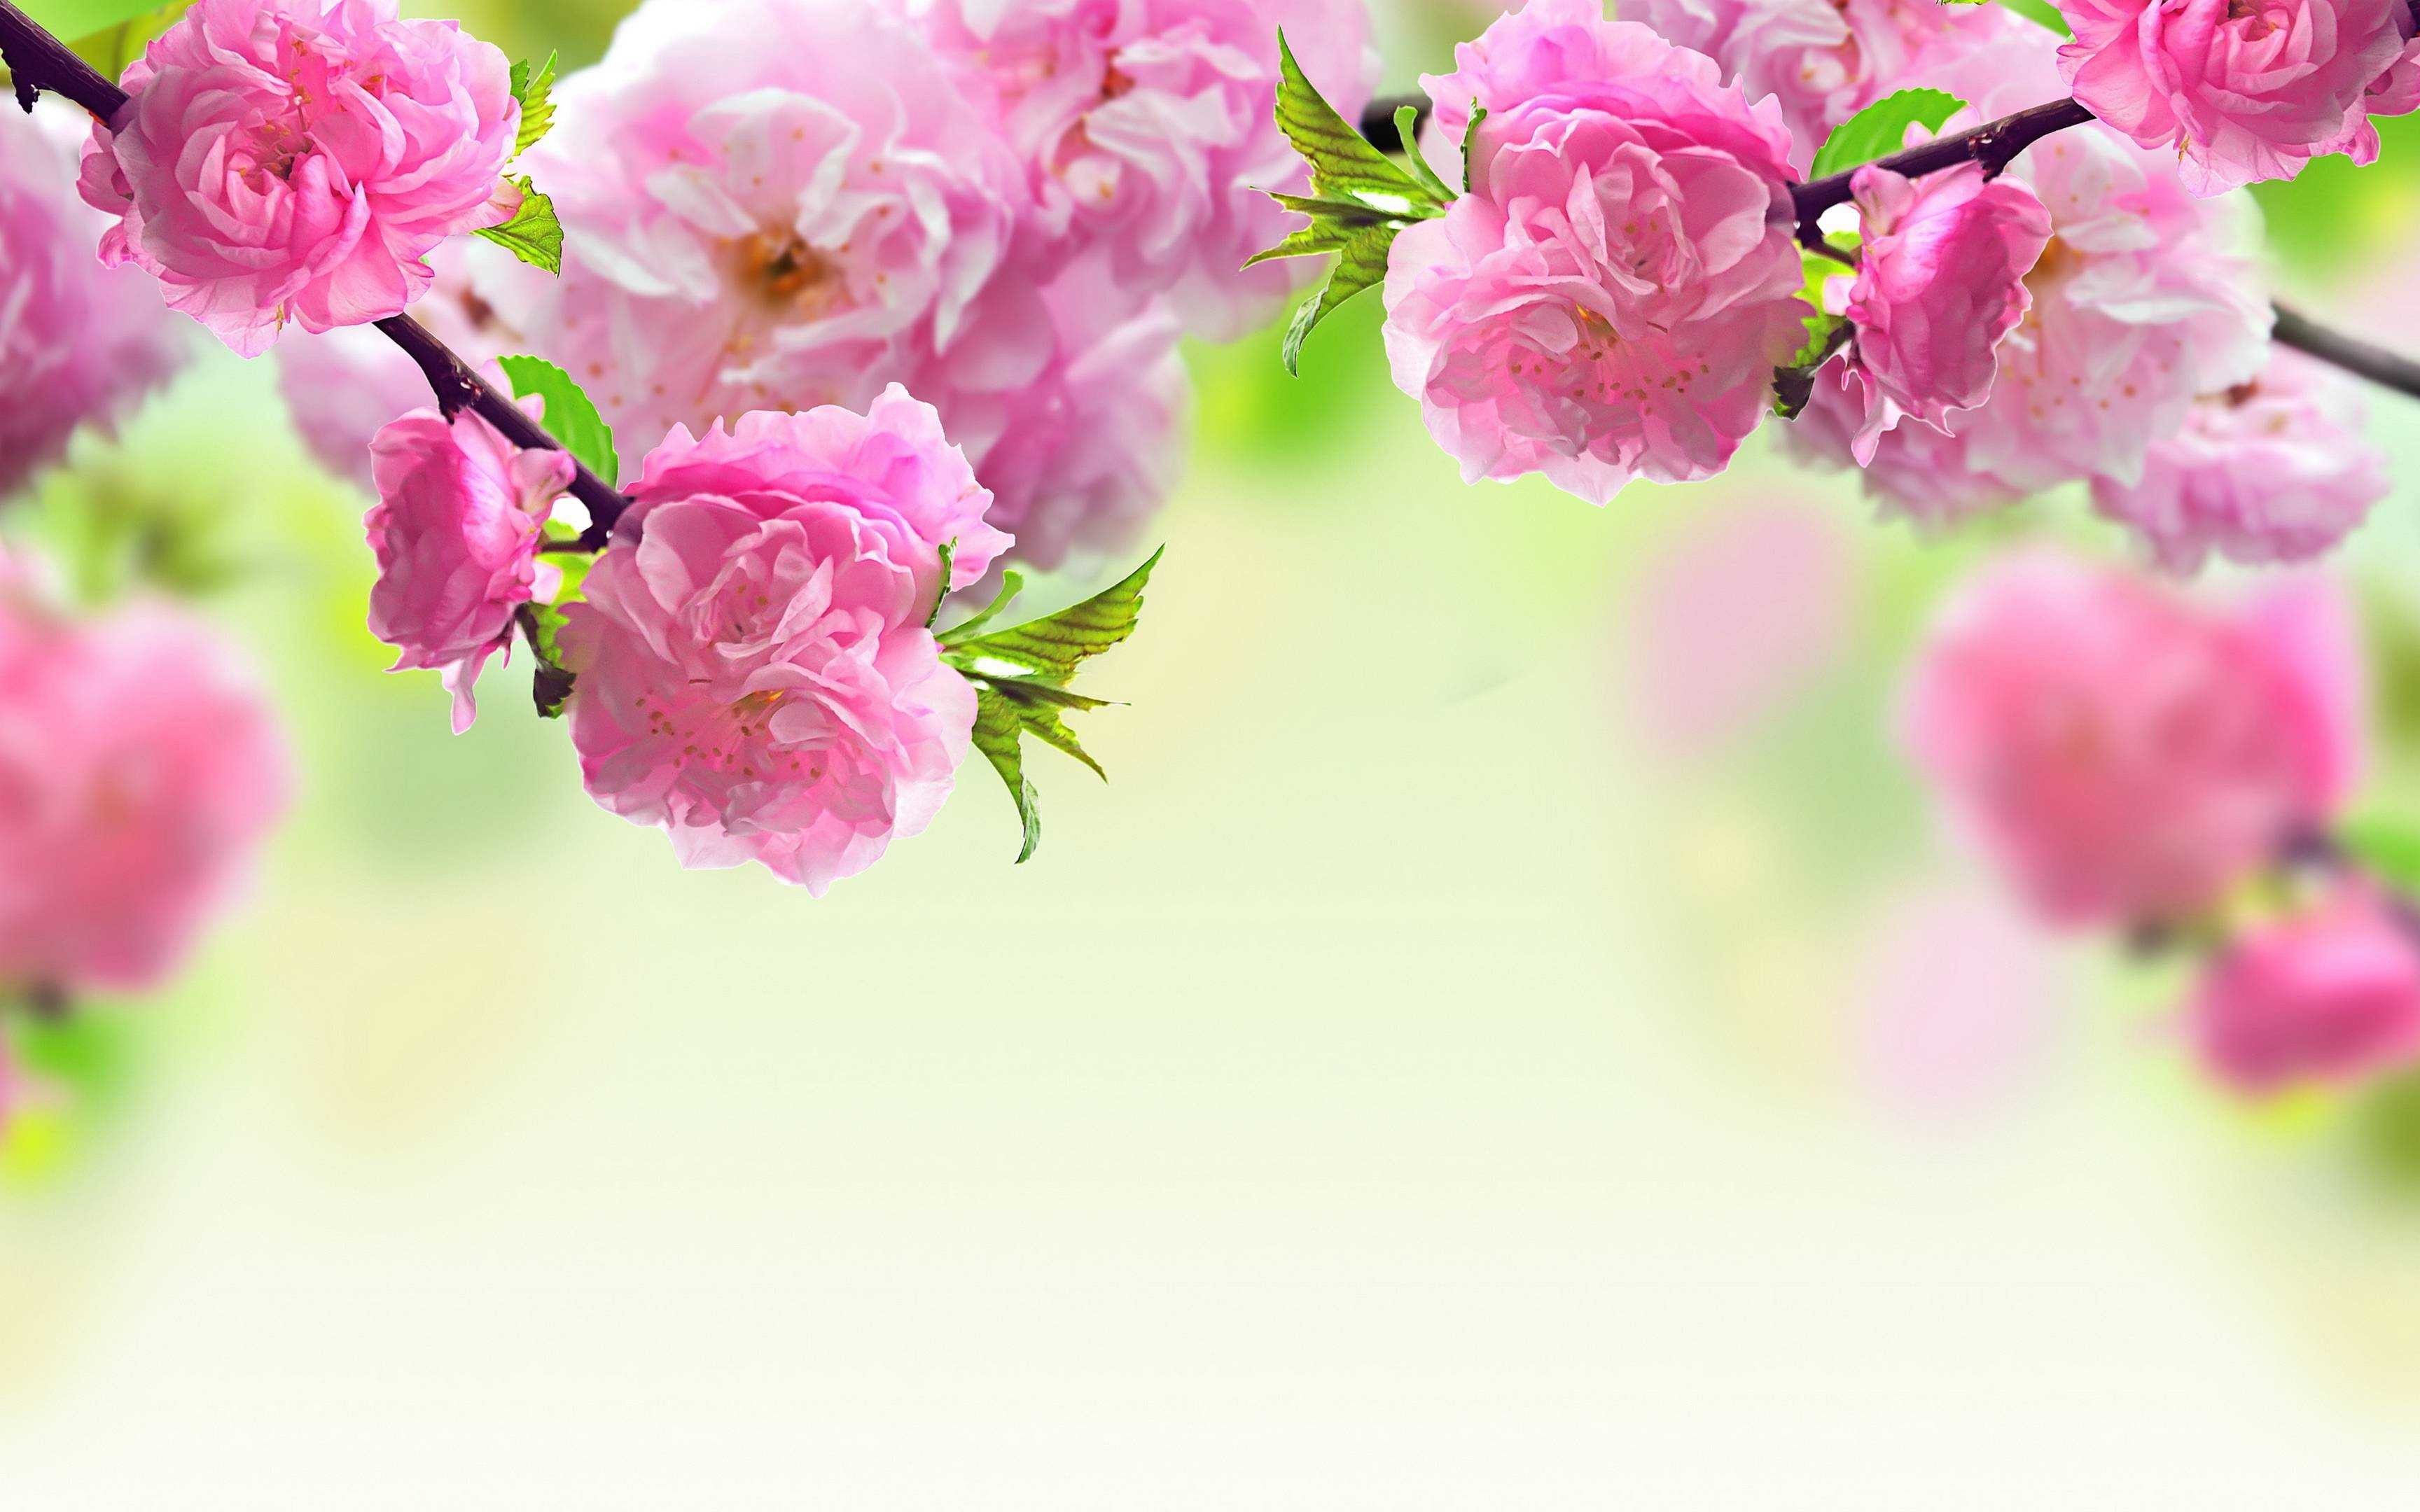 4k Flower Wallpapers Top Free 4k Flower Backgrounds Wallpaperaccess